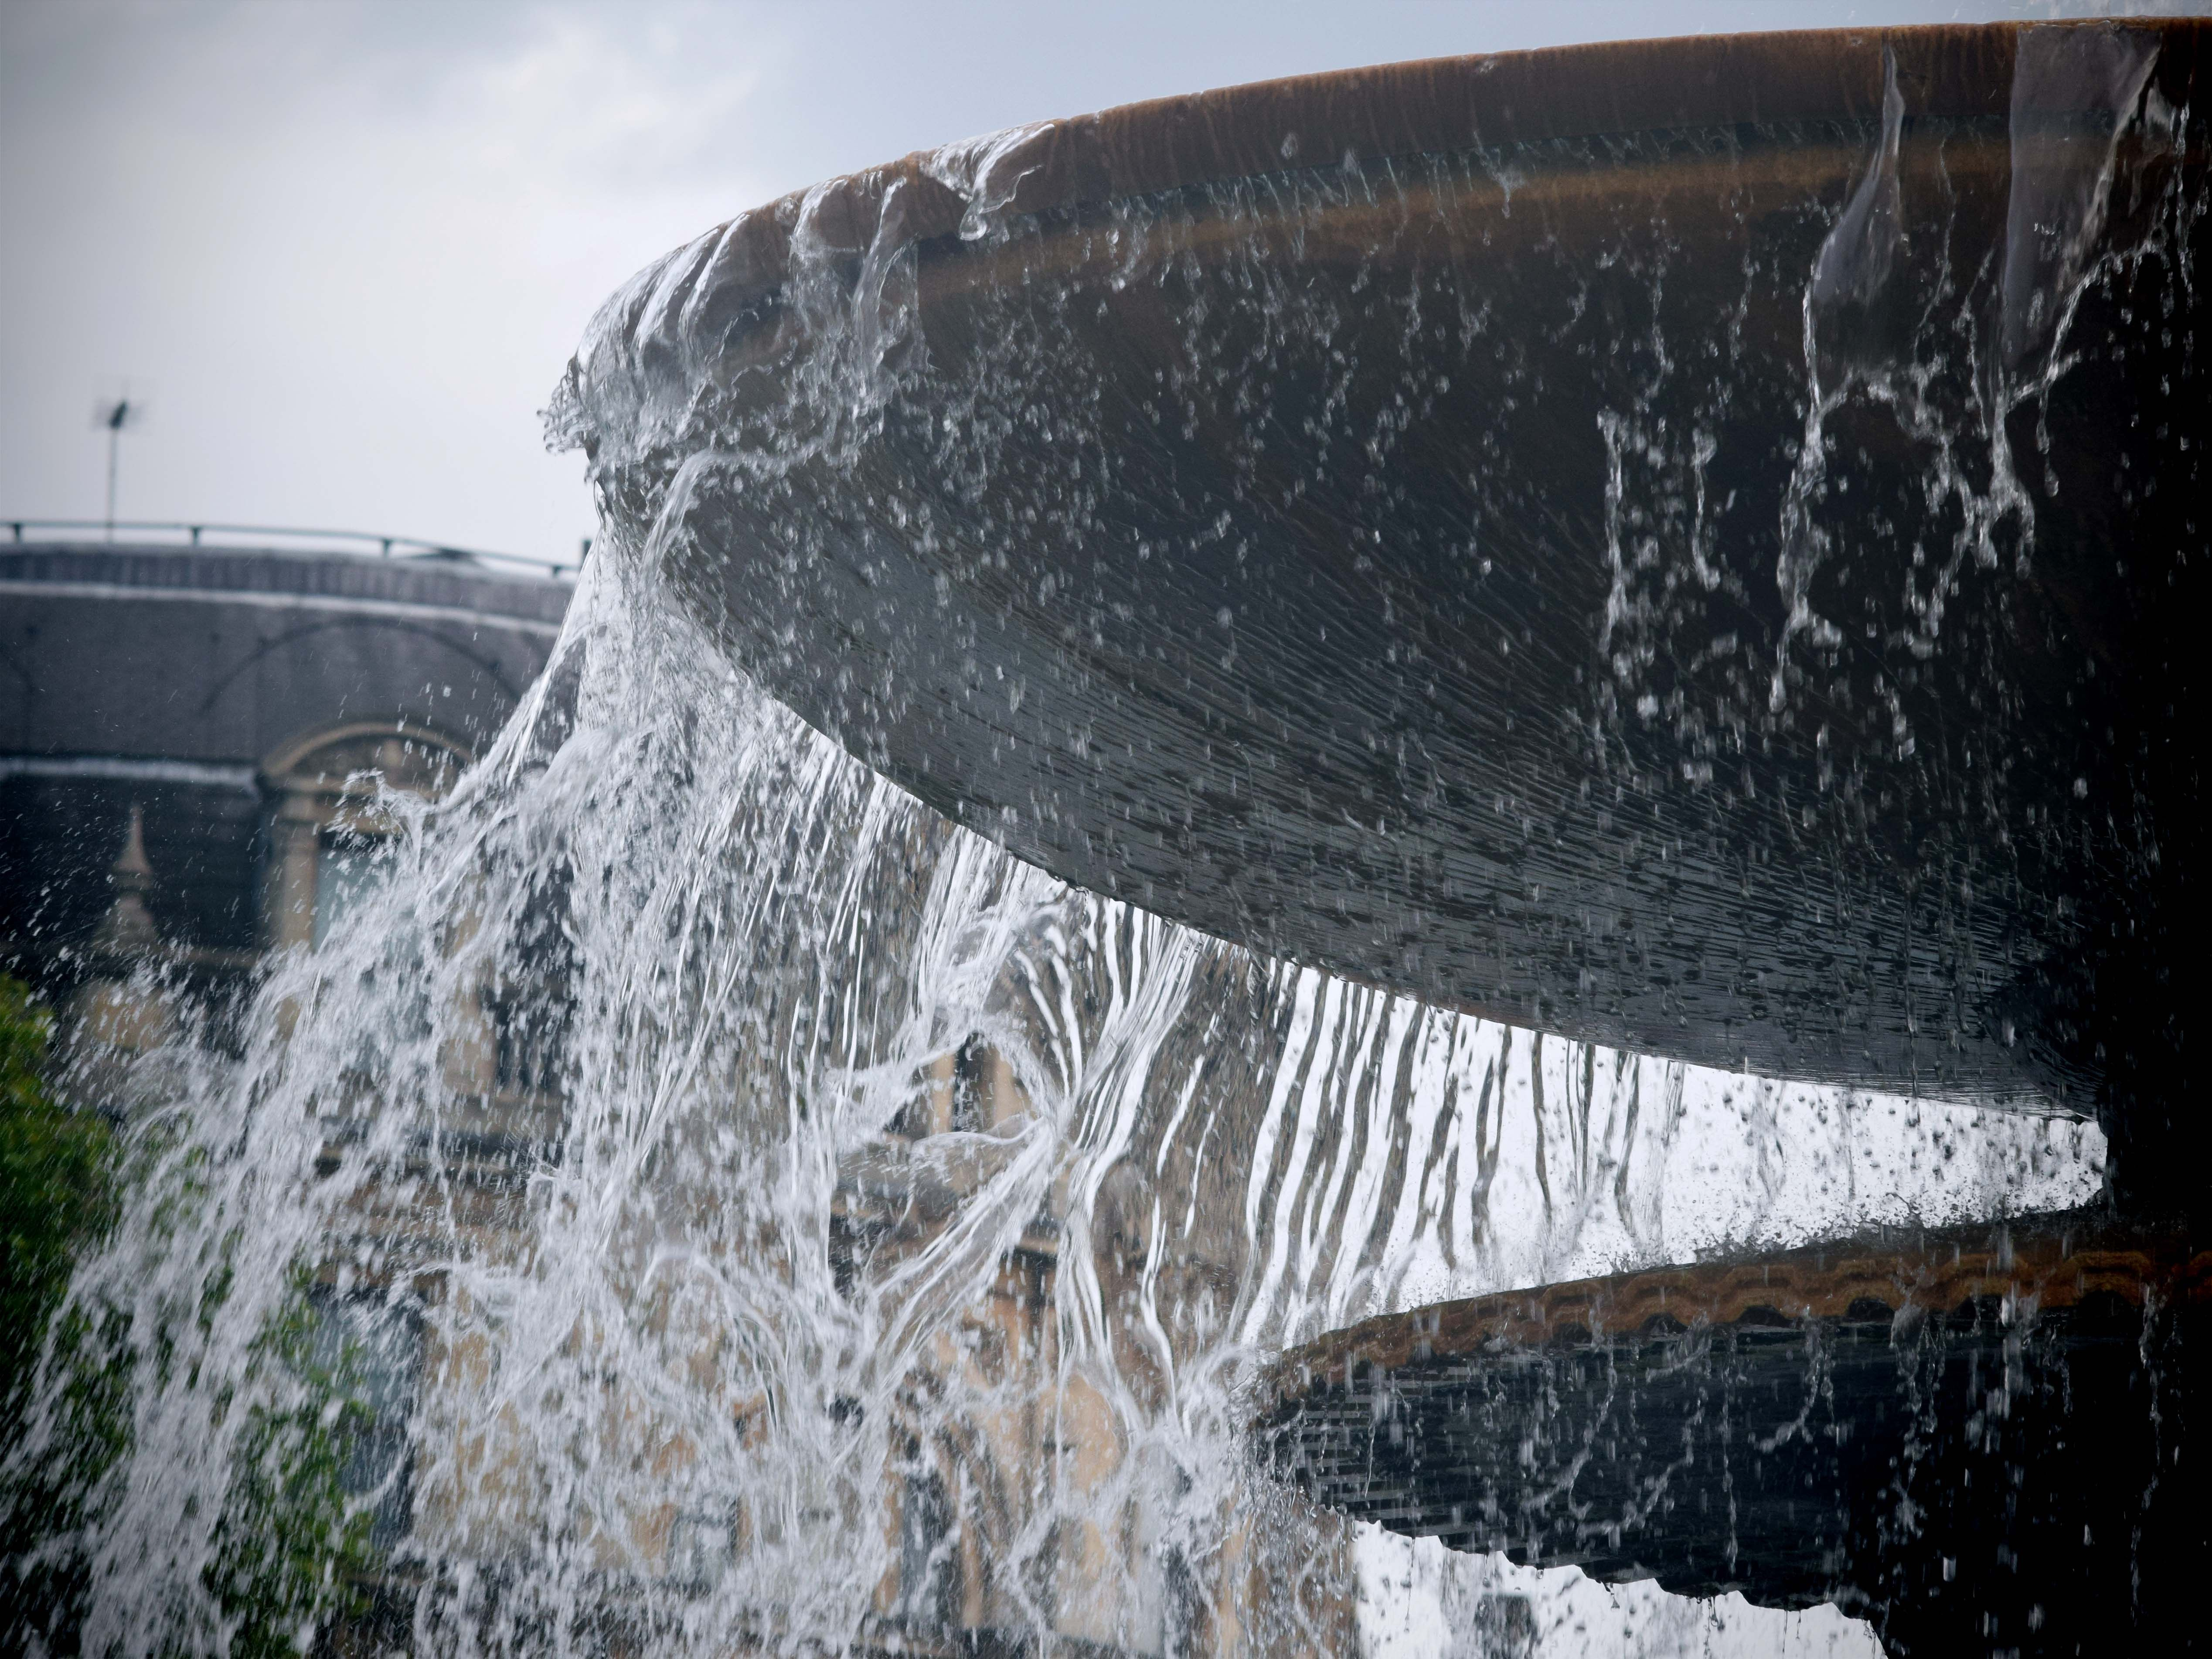 Trafalgar Fountain, 2015 - Rafe Gibbons photography